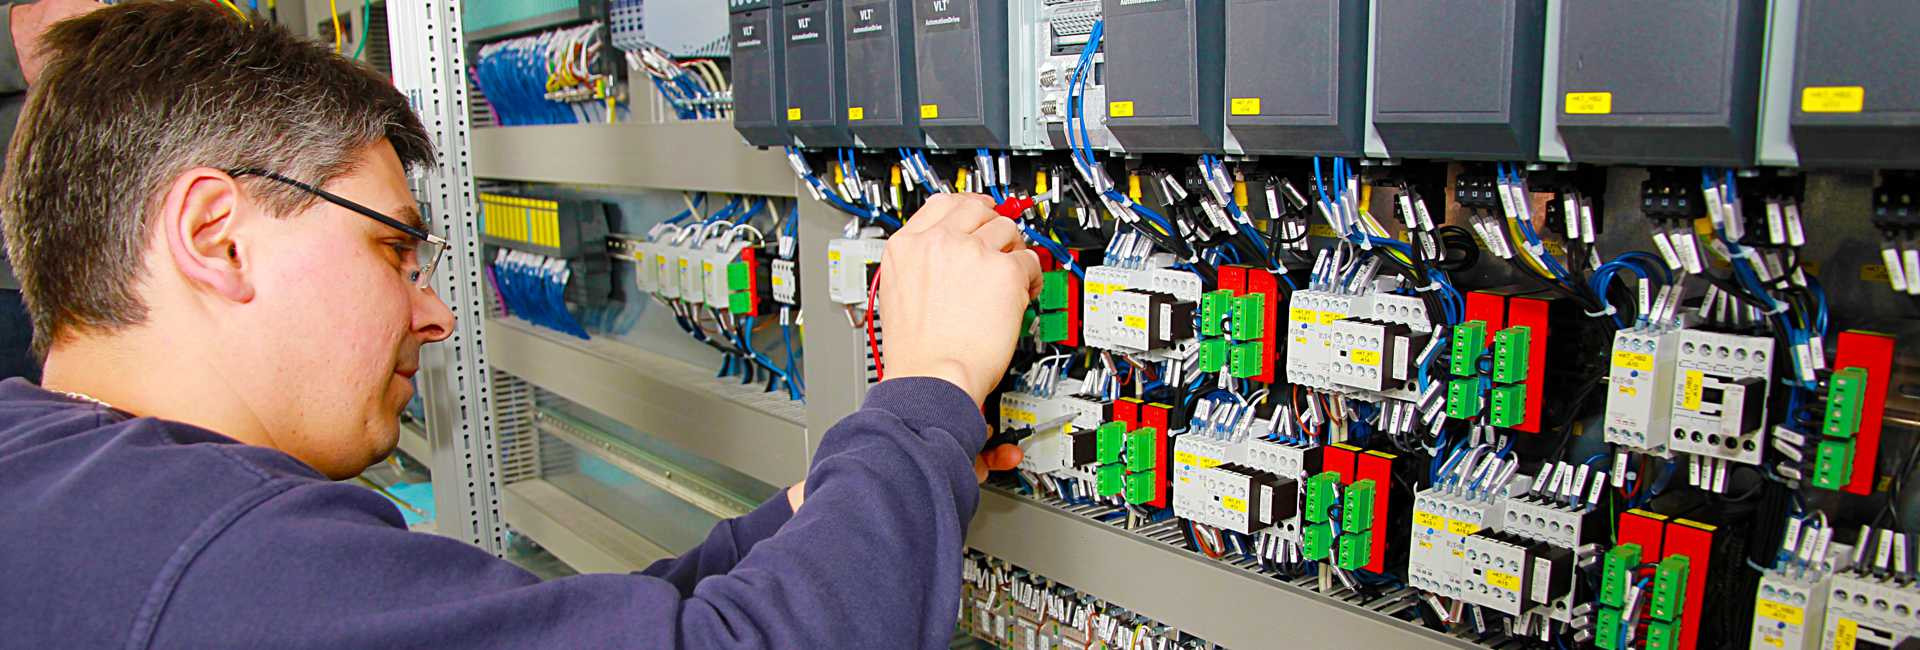 control-cabinet-778639-1920x650.jpg